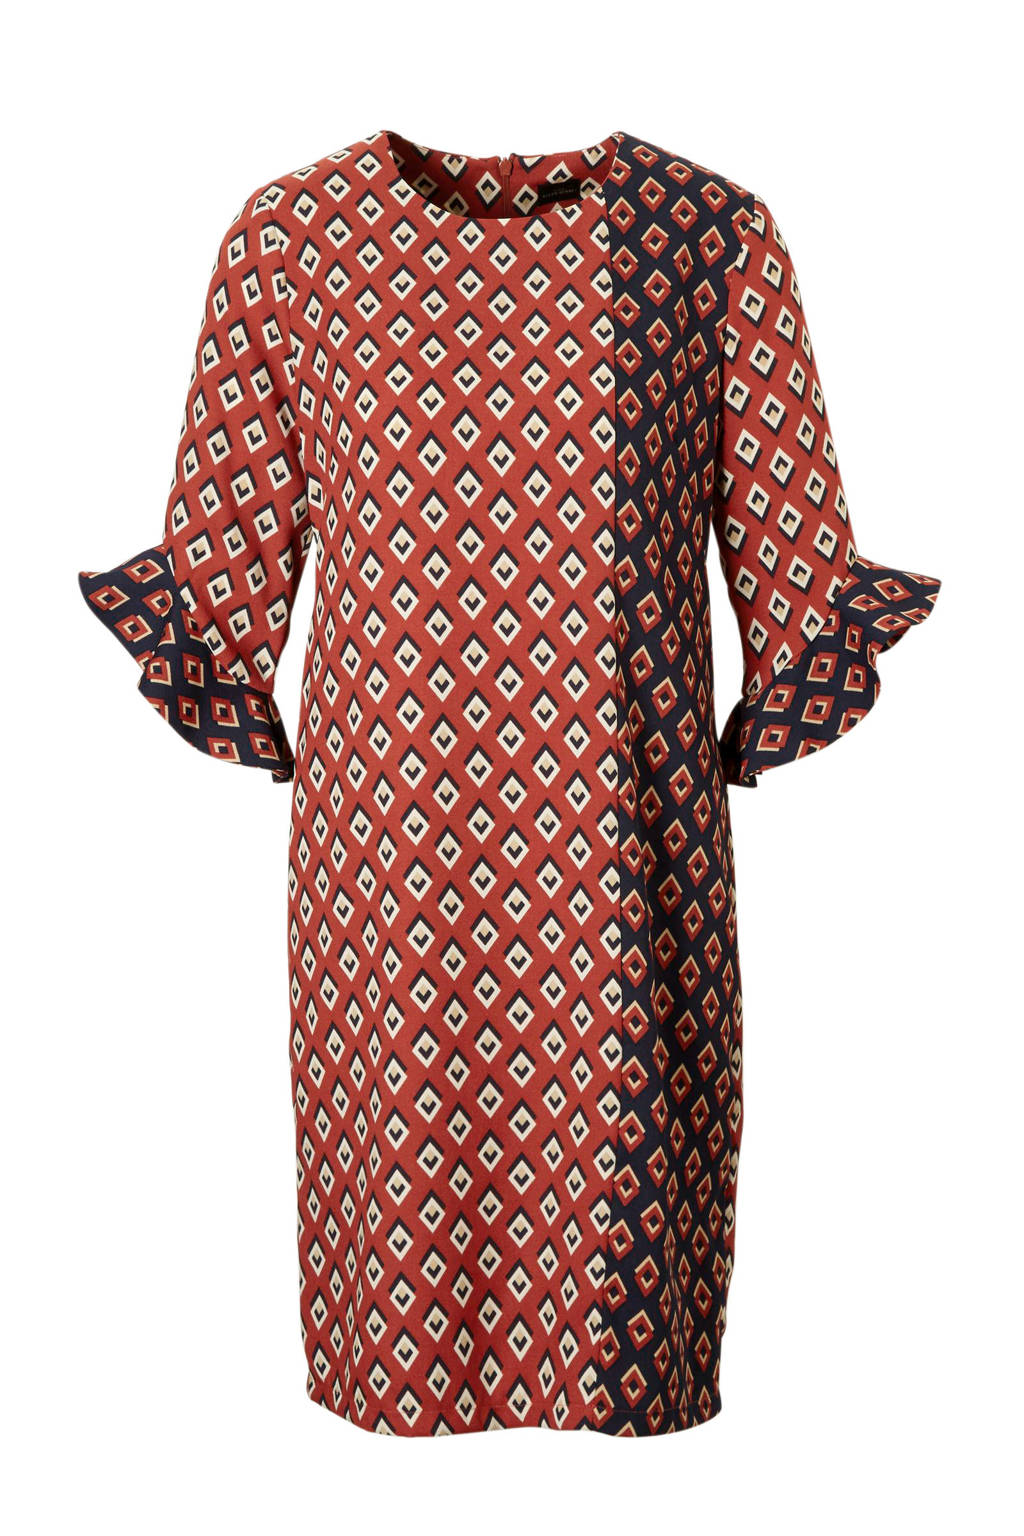 C&A YSS Shop jurk met all over print brique, Brique/donkerblauw